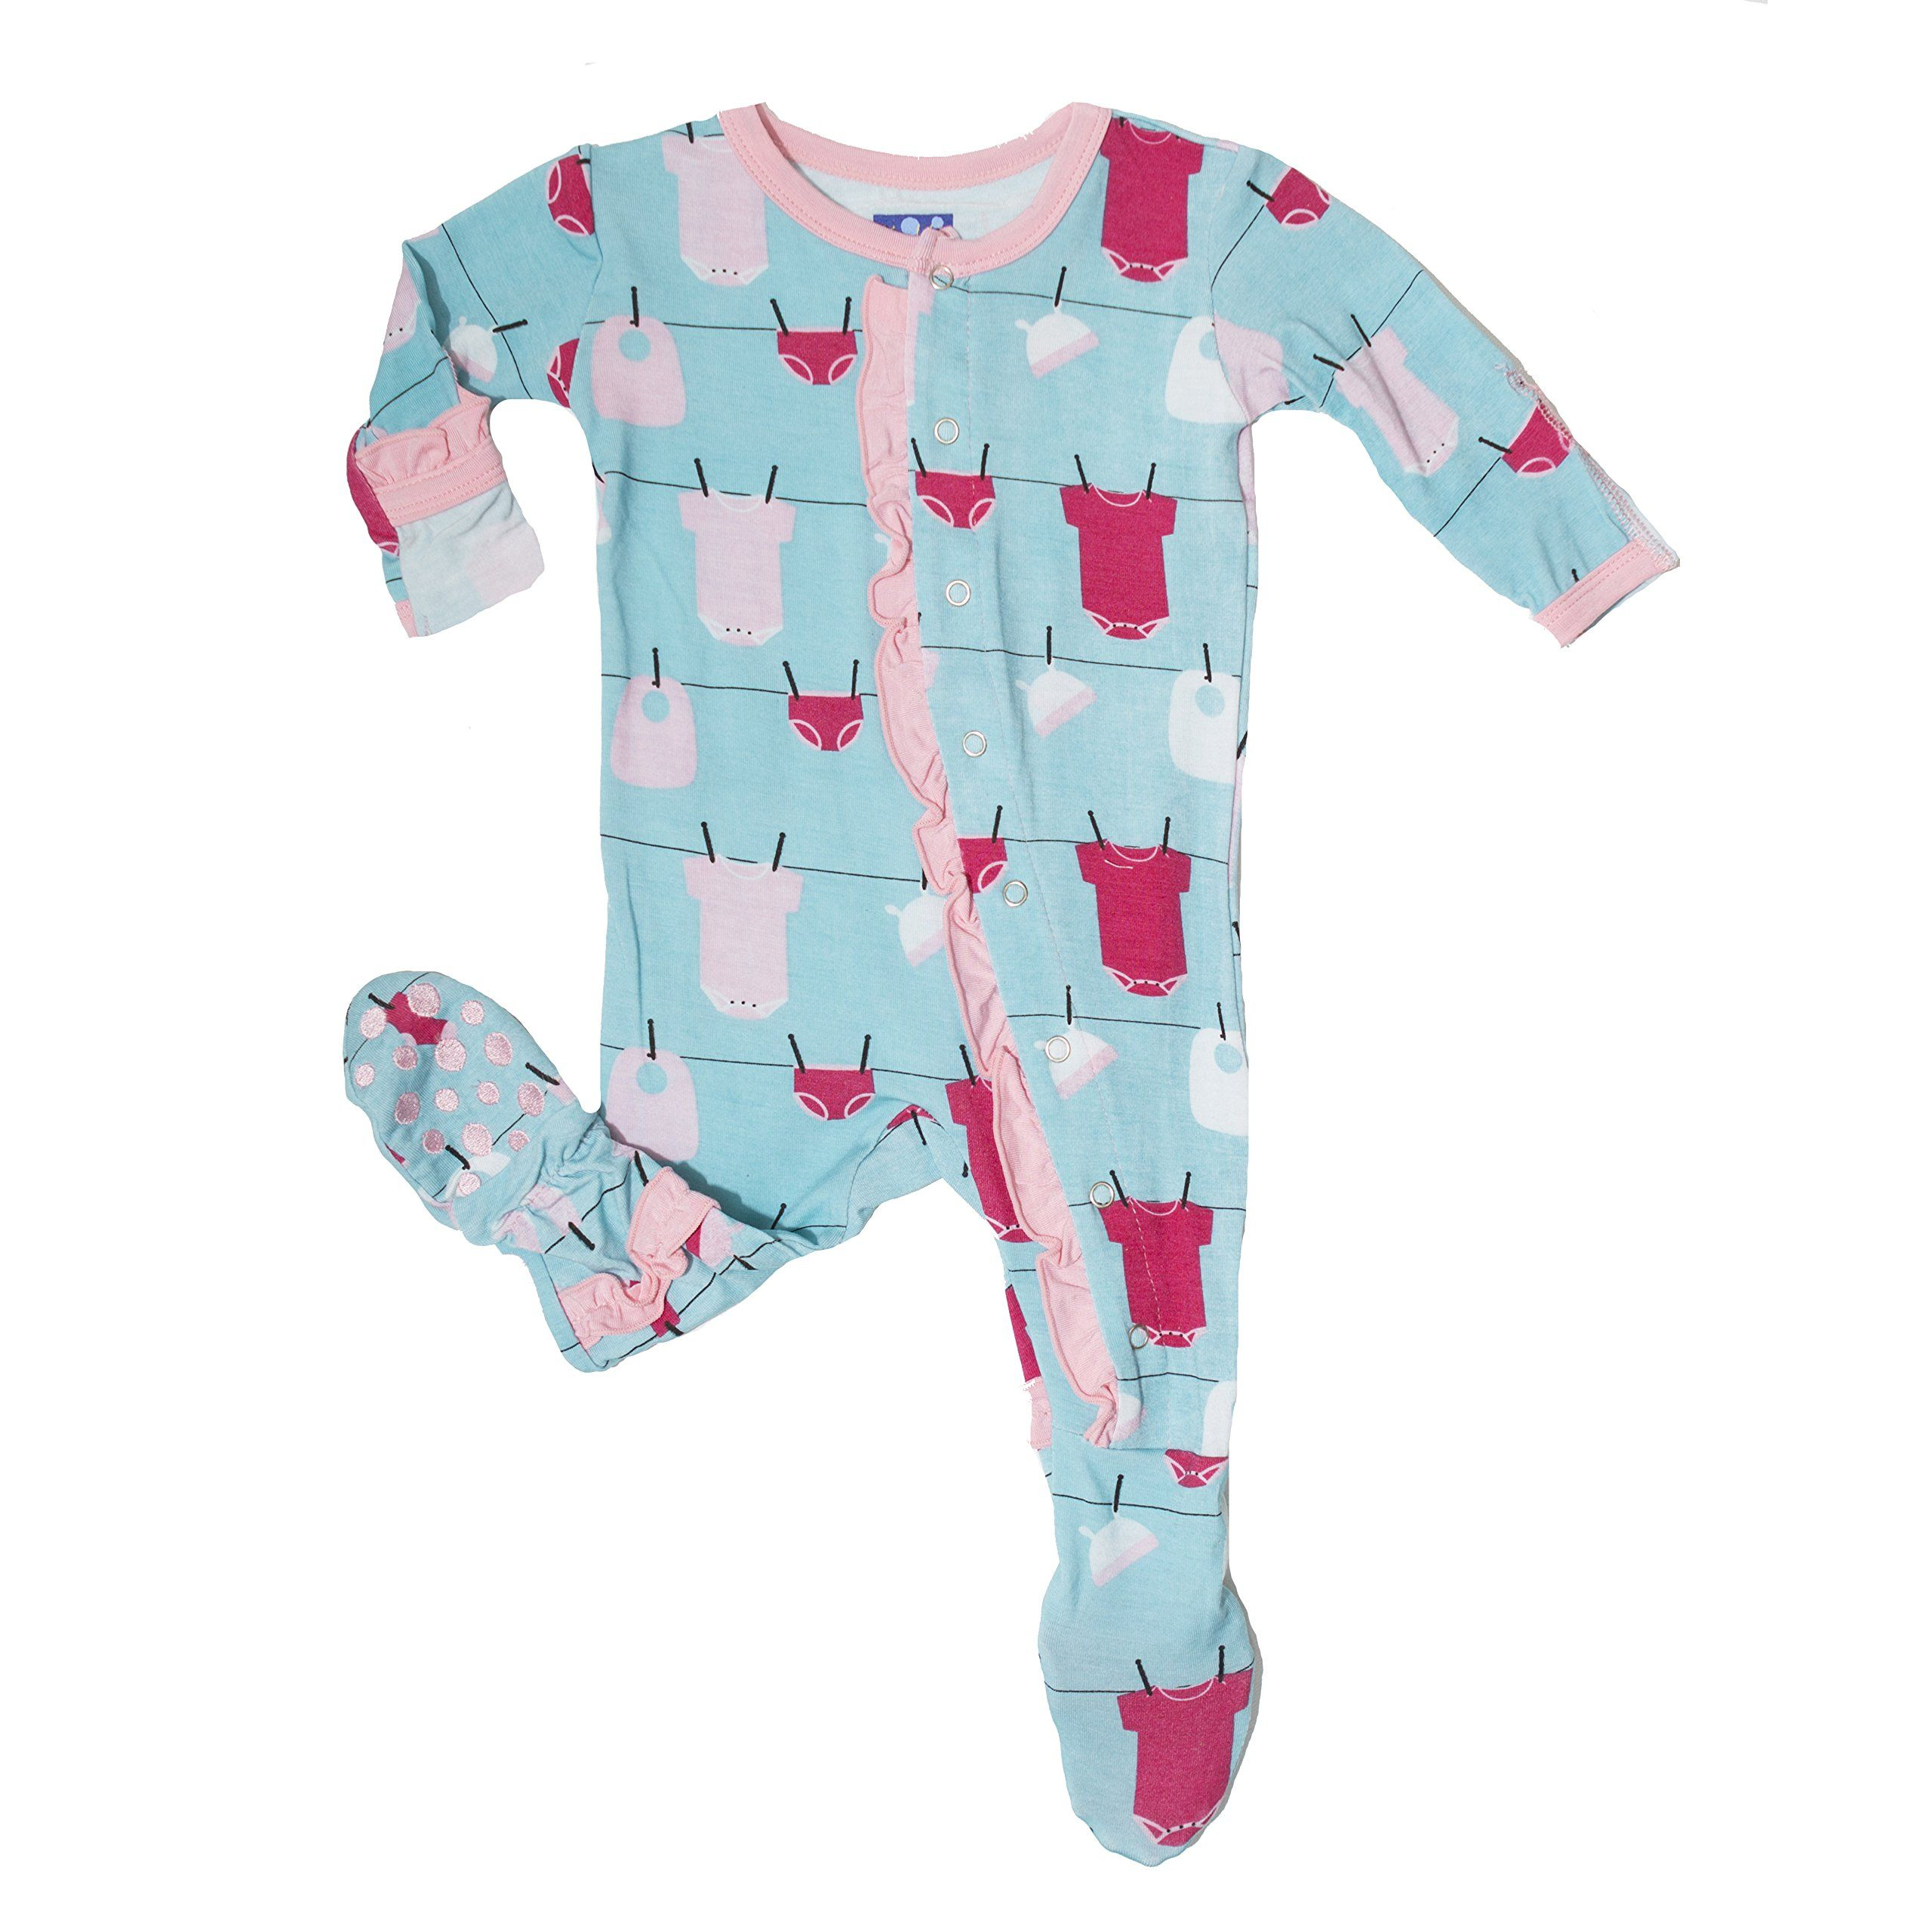 KicKee Pants Little Girls Ruffle Footie Pajama Natural Flip Flop